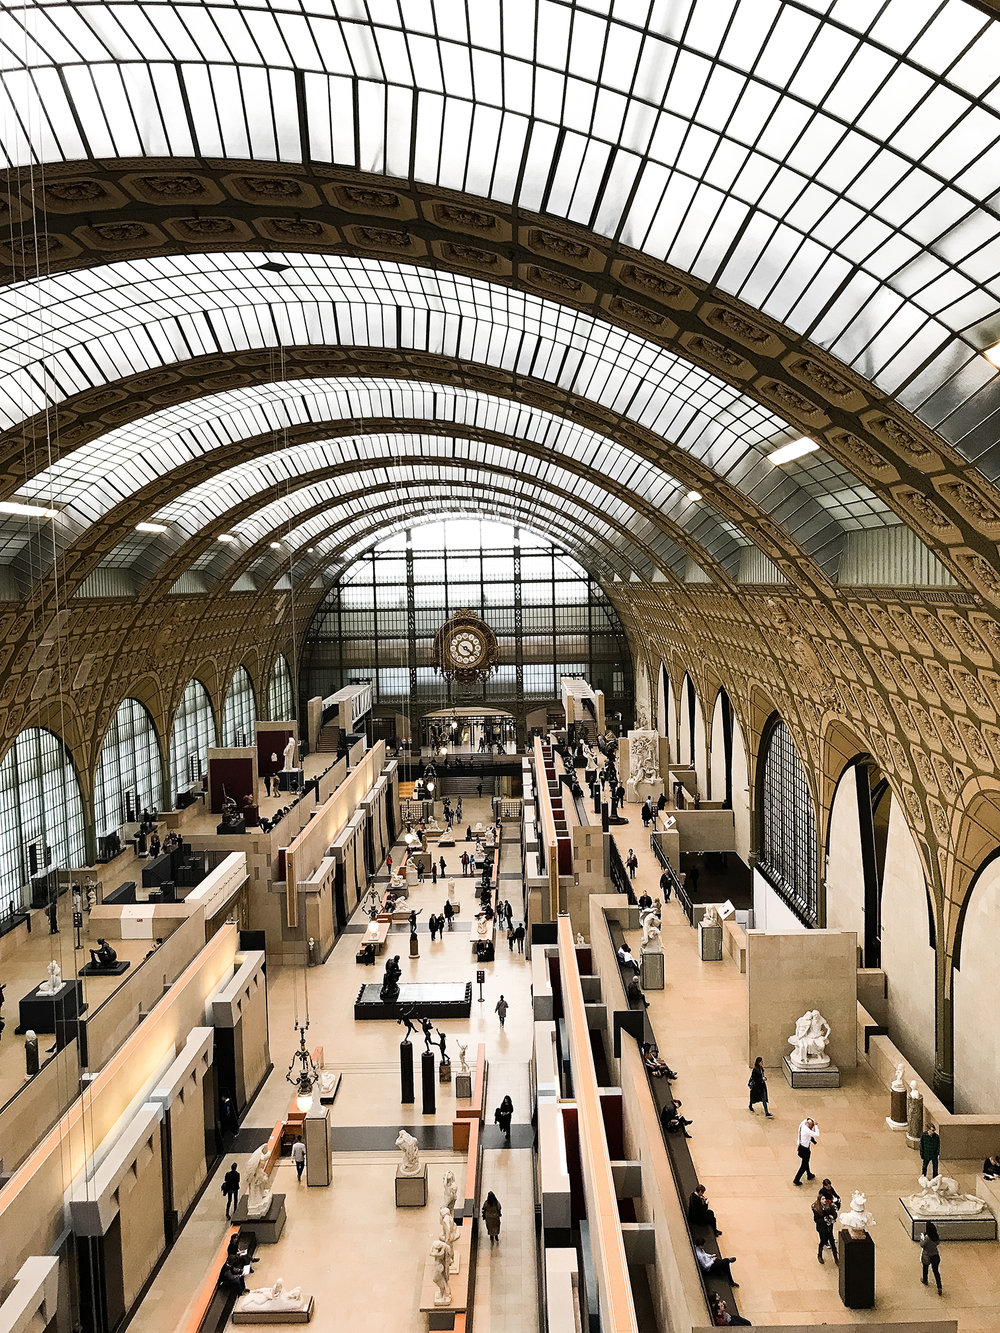 sheila-burgos-paris-Musée d'Orsay.jpg